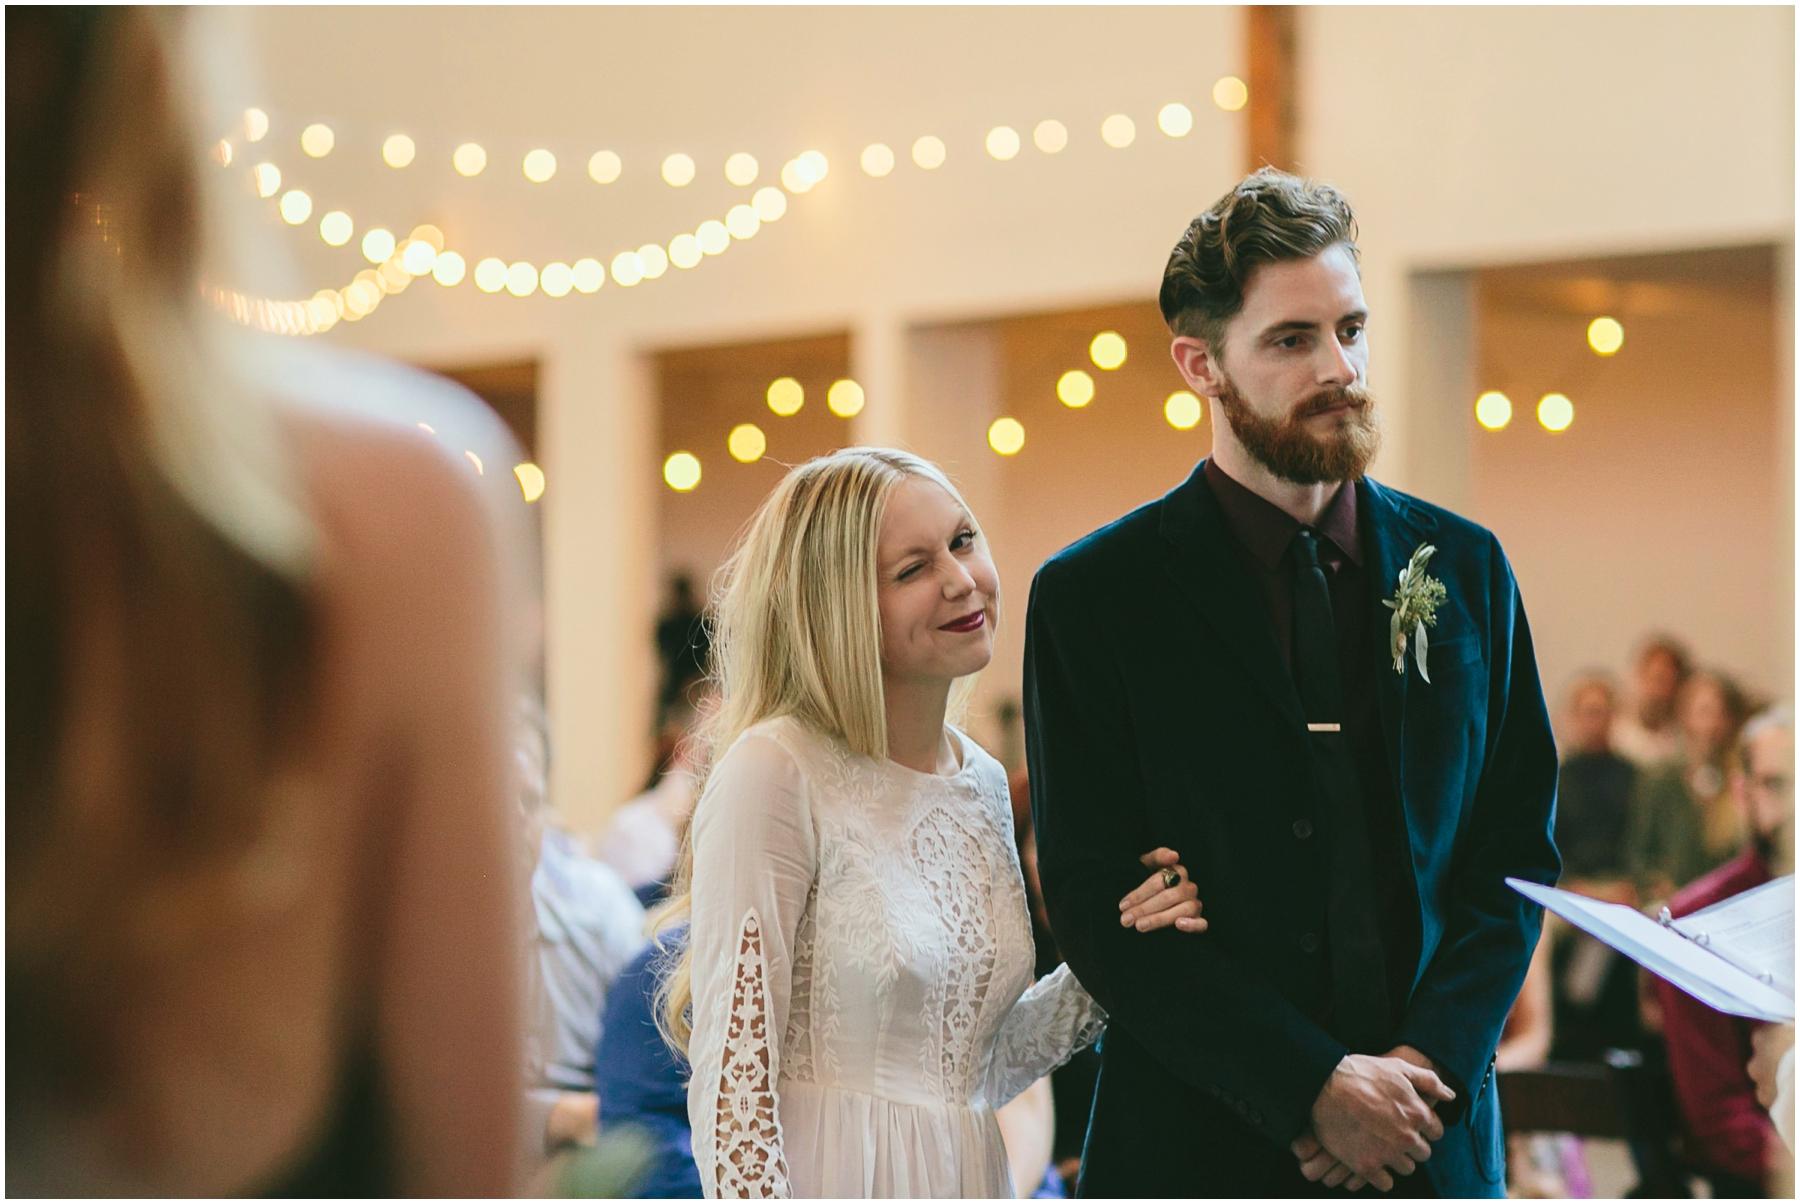 Natalie+Corey-WEDDING_KELLYBOITANO_0089